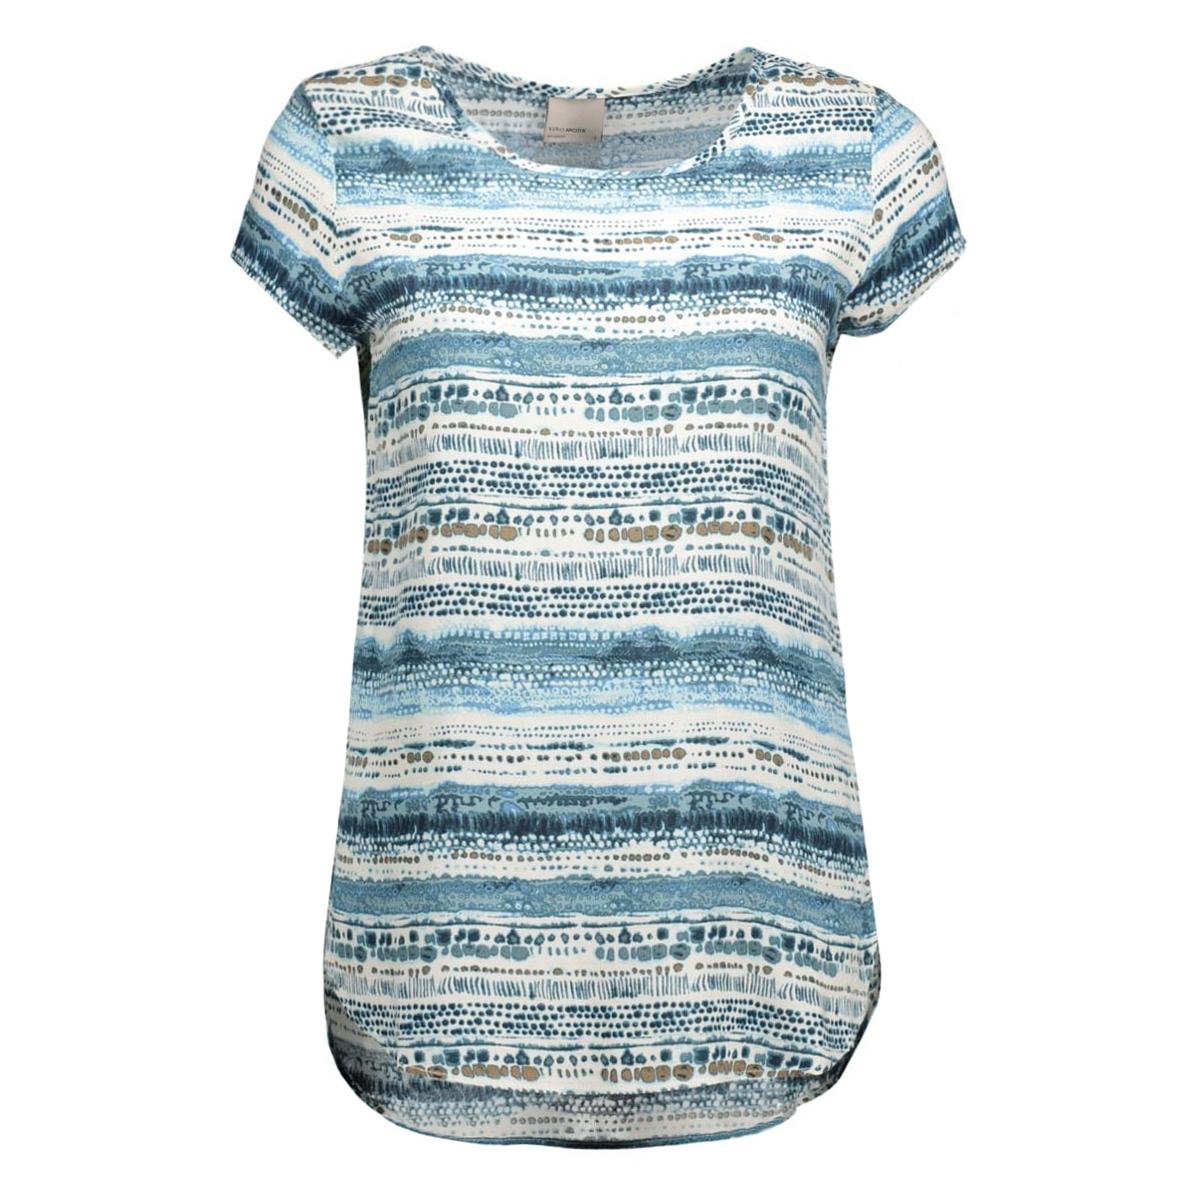 vmboca ss blouse multi printed 10132802 vero moda t-shirt moonbeam/nate print